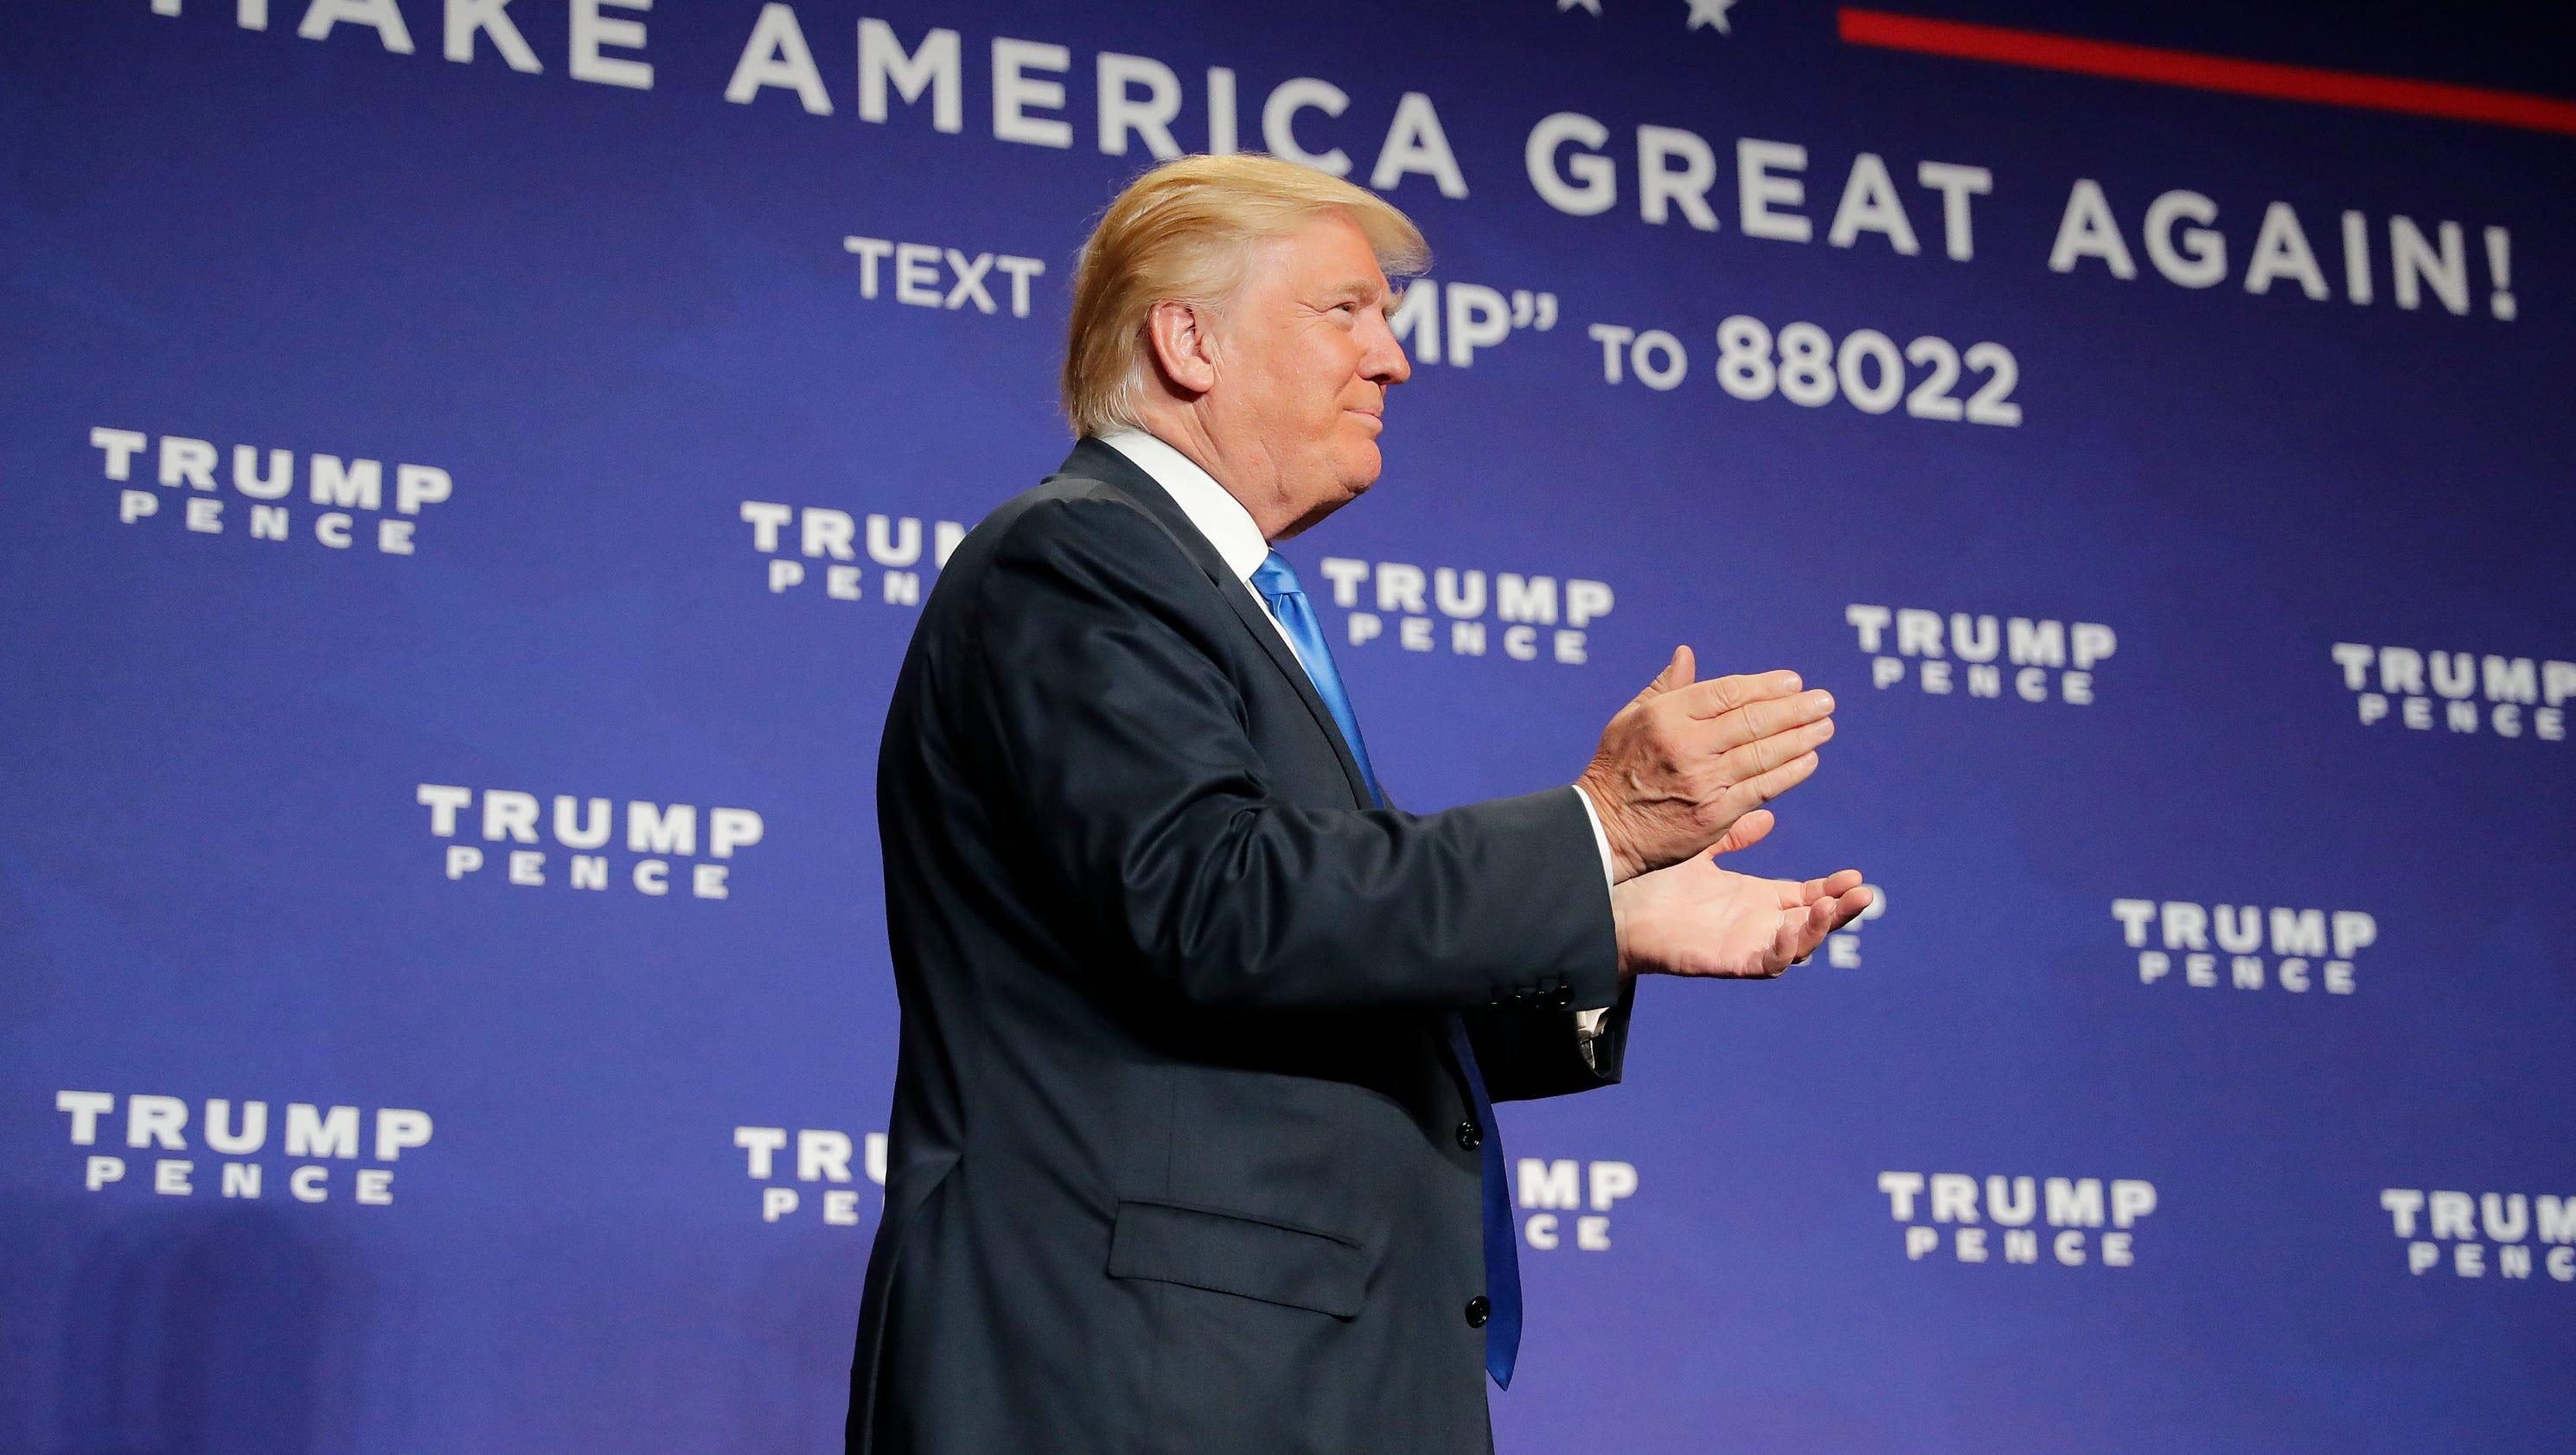 story news politics elections fact check donald trump false misleading claims